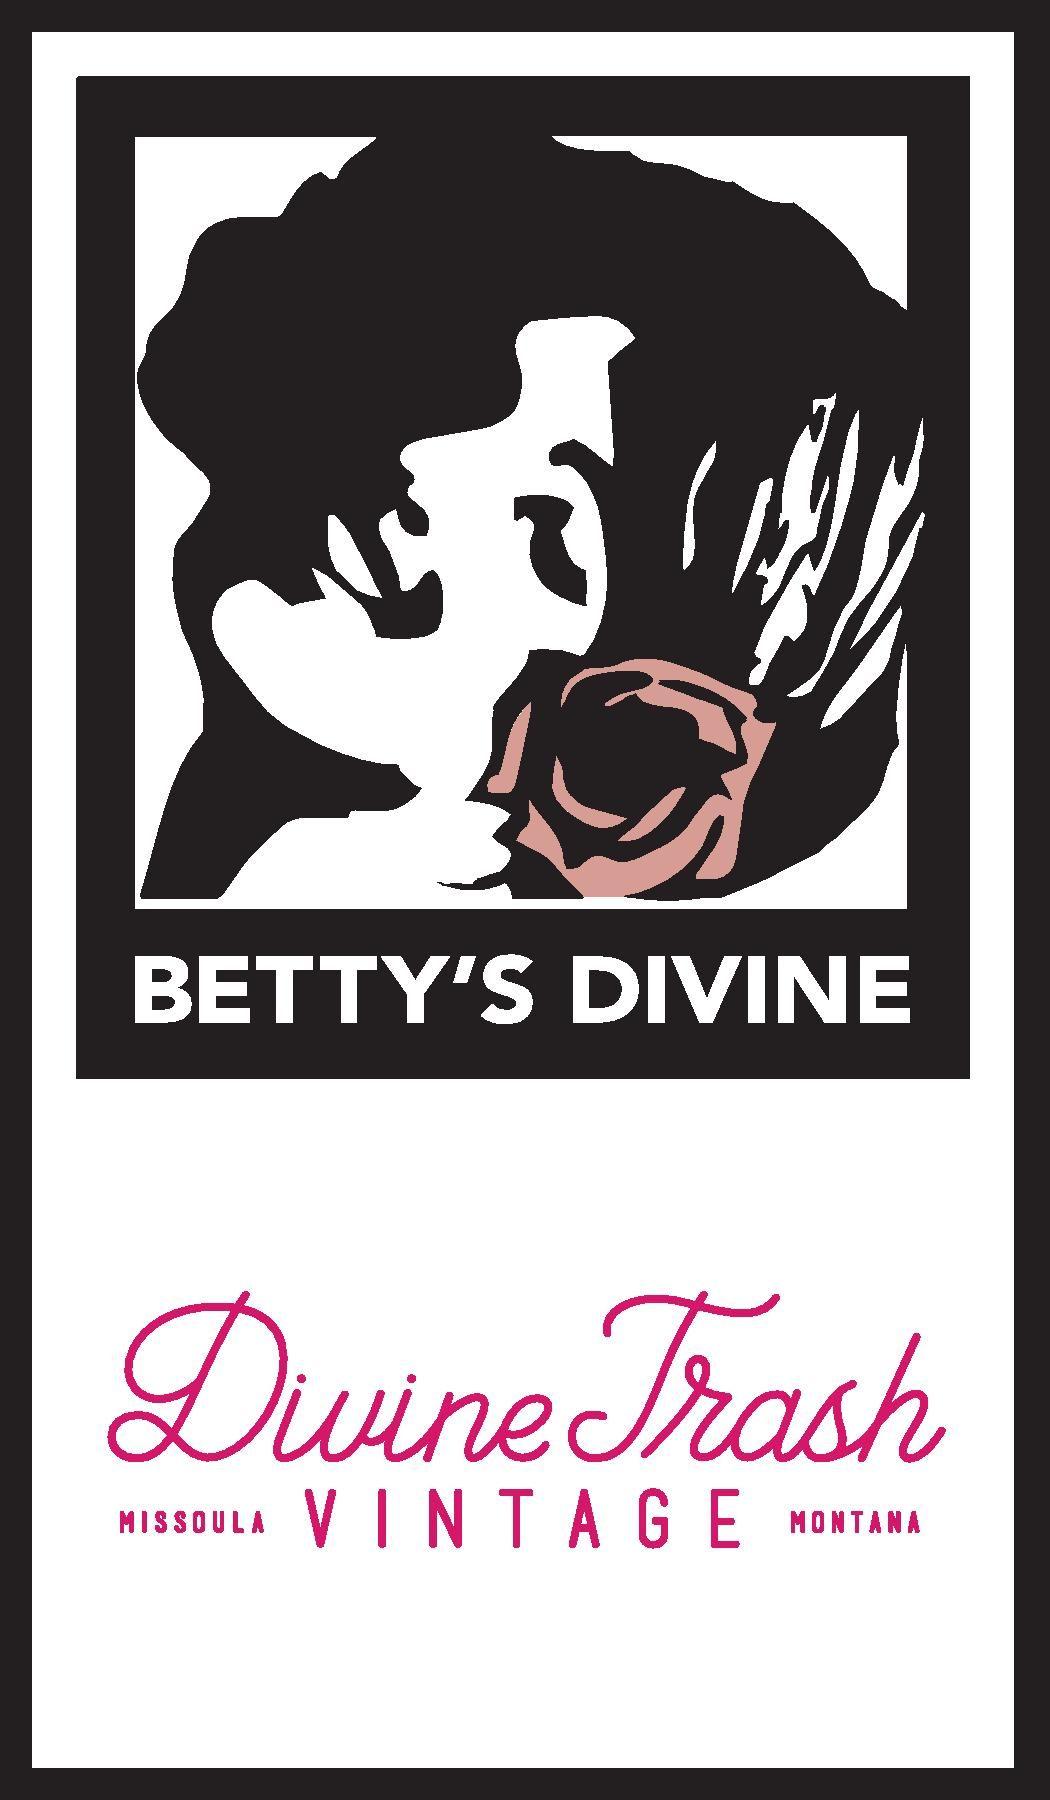 Betty's Divine